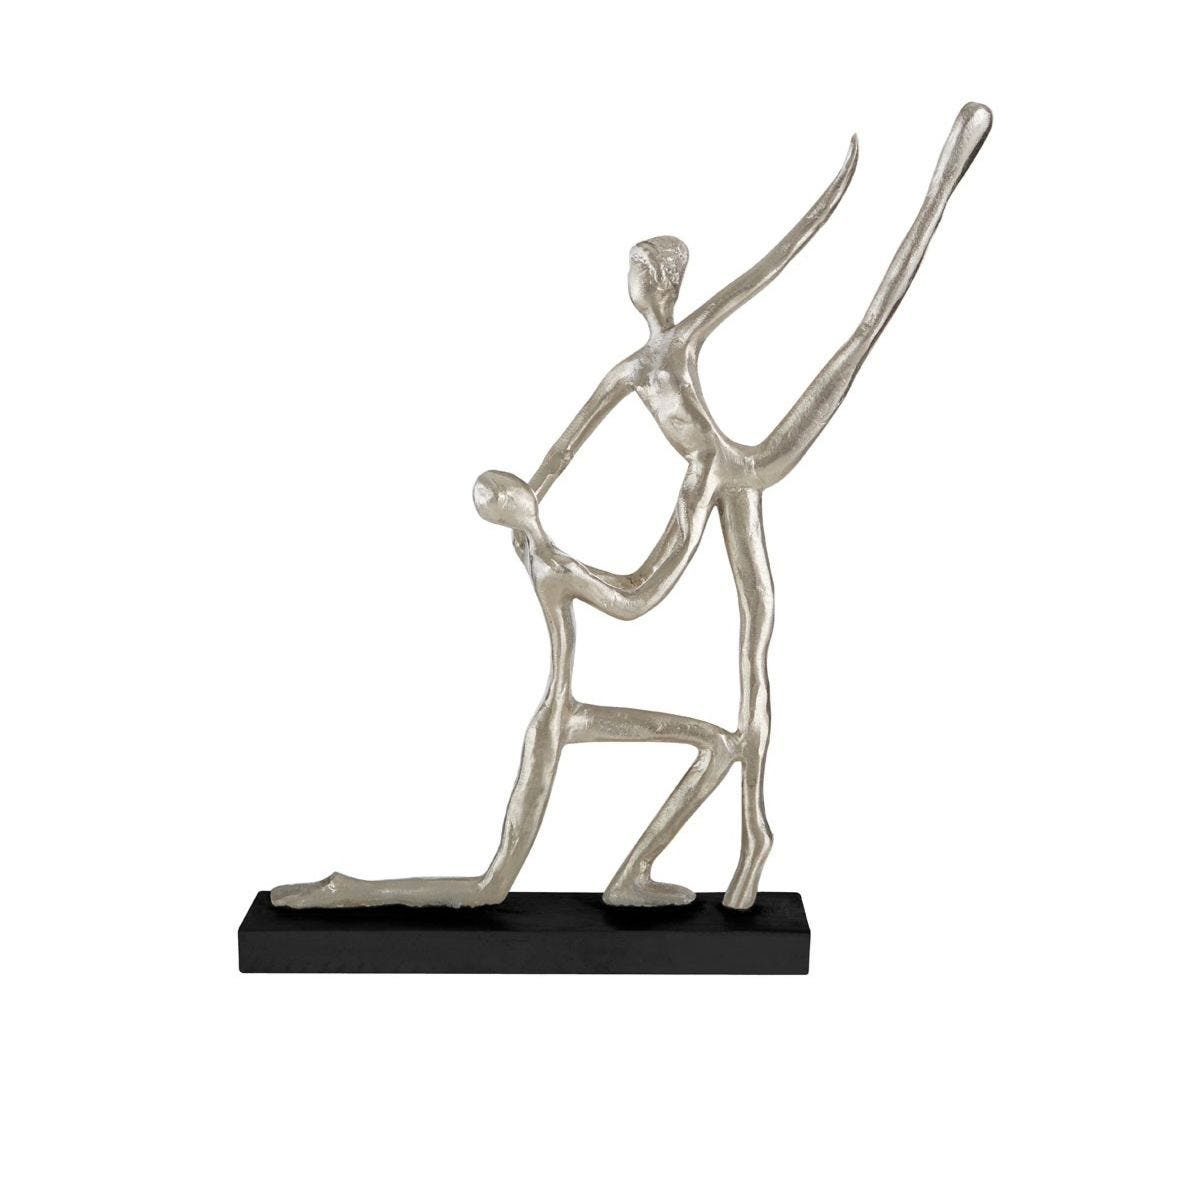 Premier Housewares Dance Couple Figurine - Silver/Black